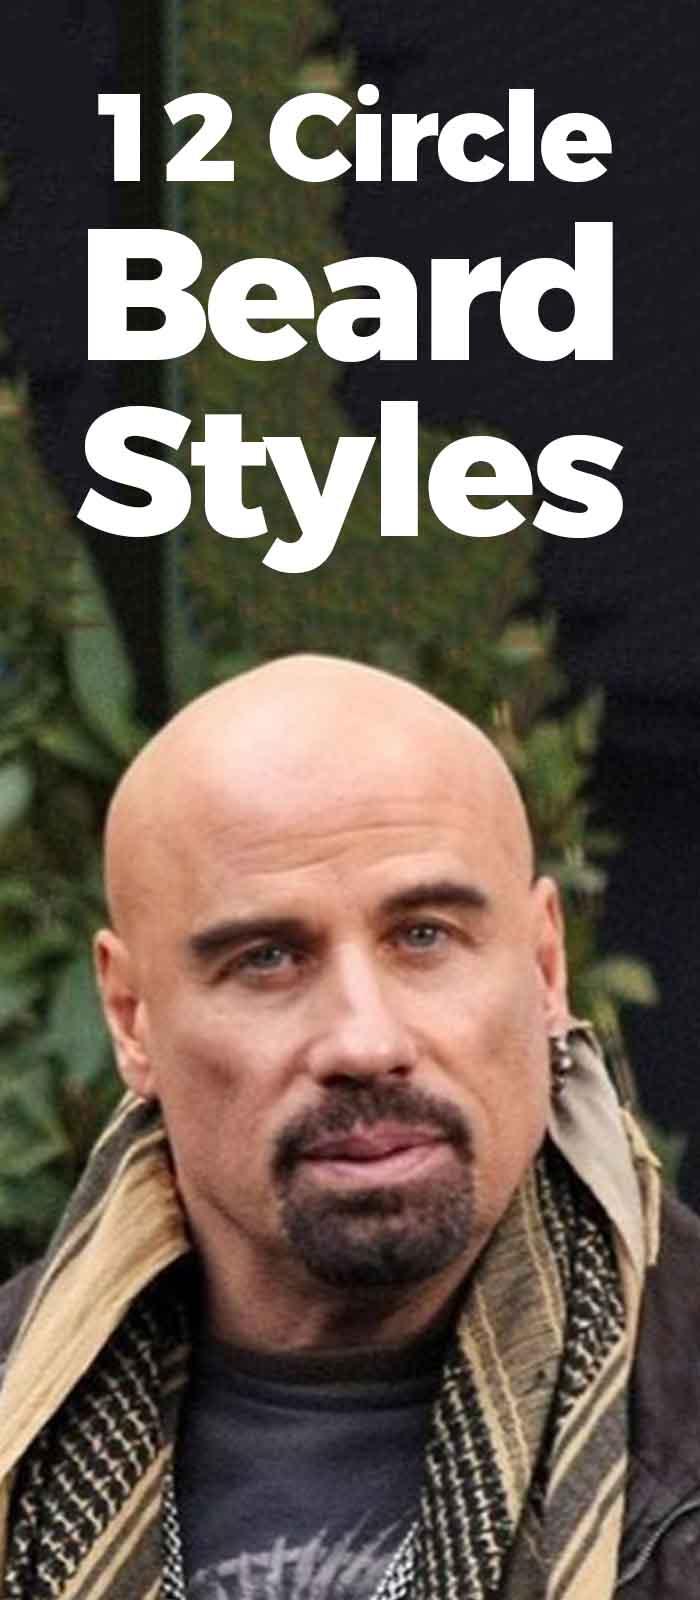 Circle style beard for men!